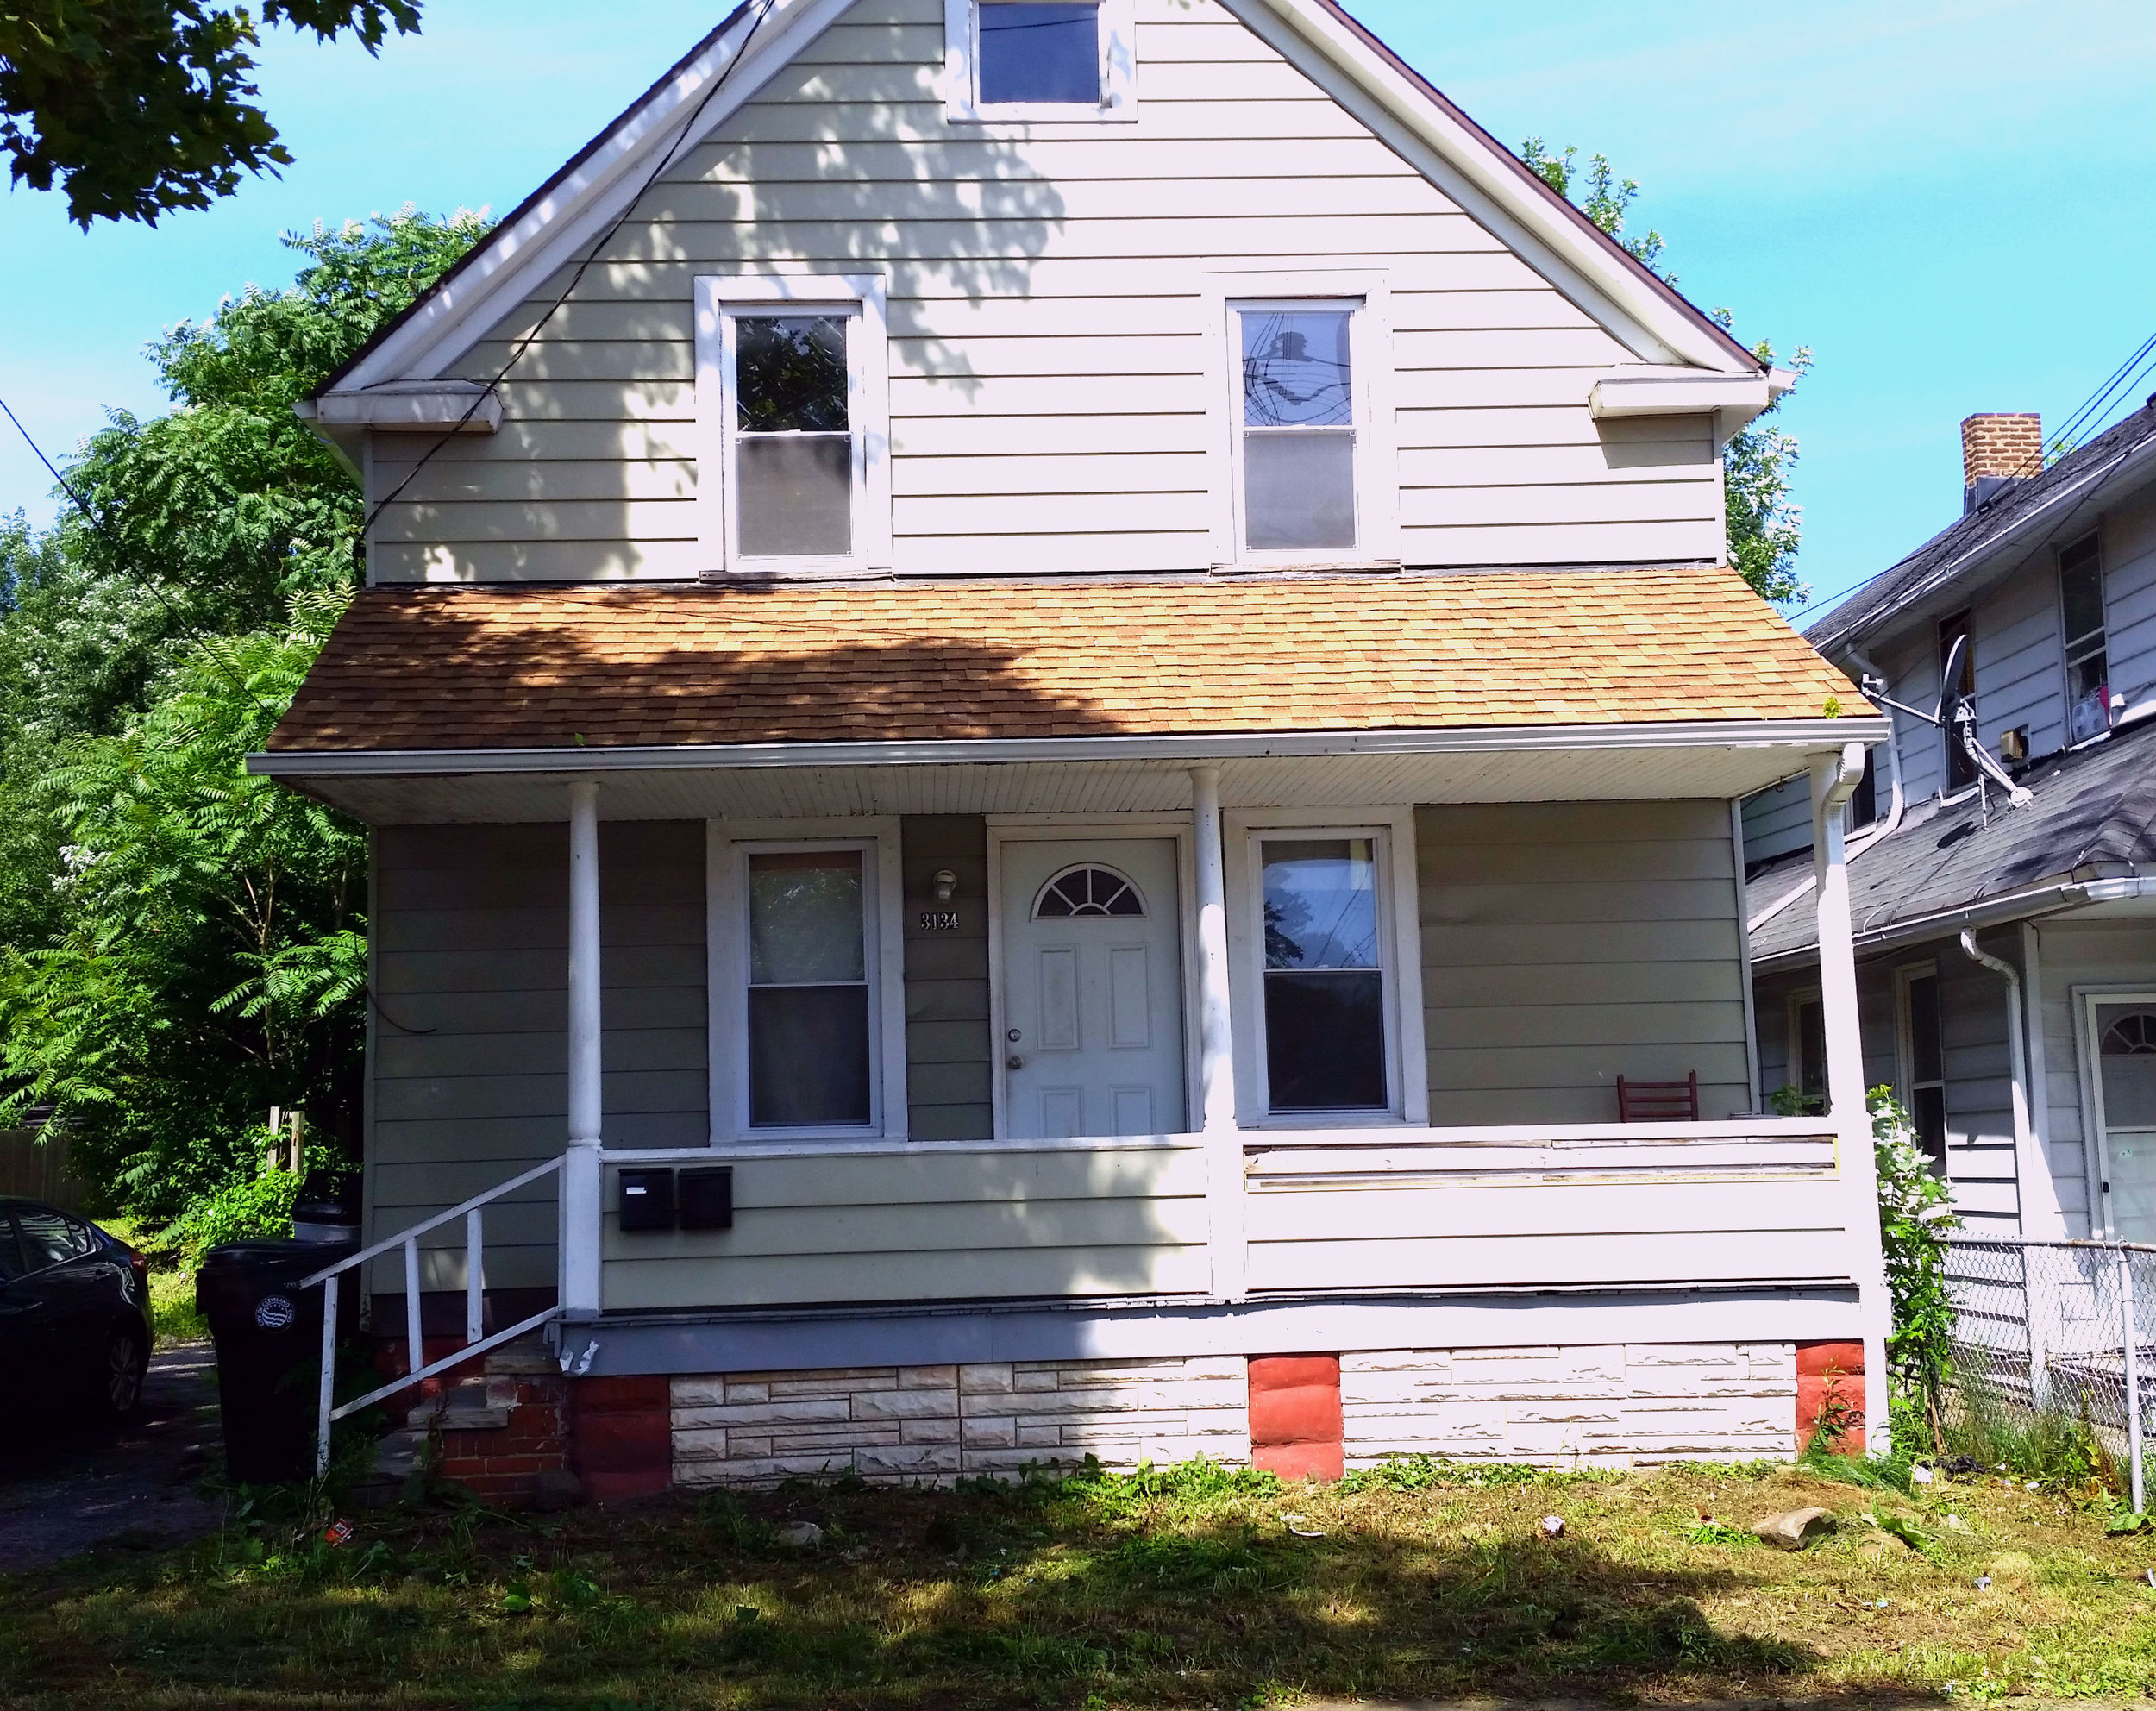 3134 W 46 St., Cleveland | 5 bed 2 bath | 1,674 Sq. Ft. | $24,000